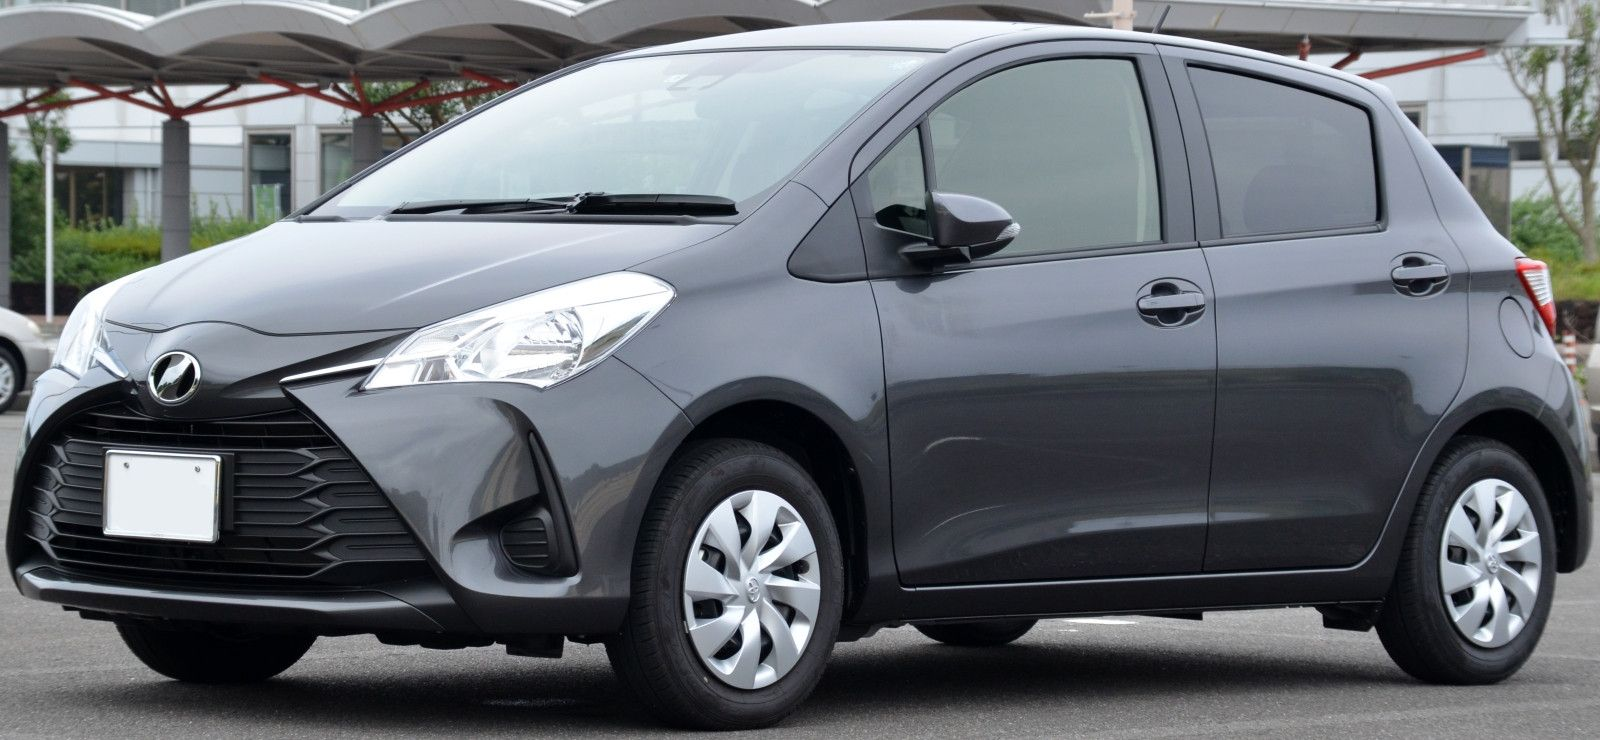 2020 toyota Verso Toyota